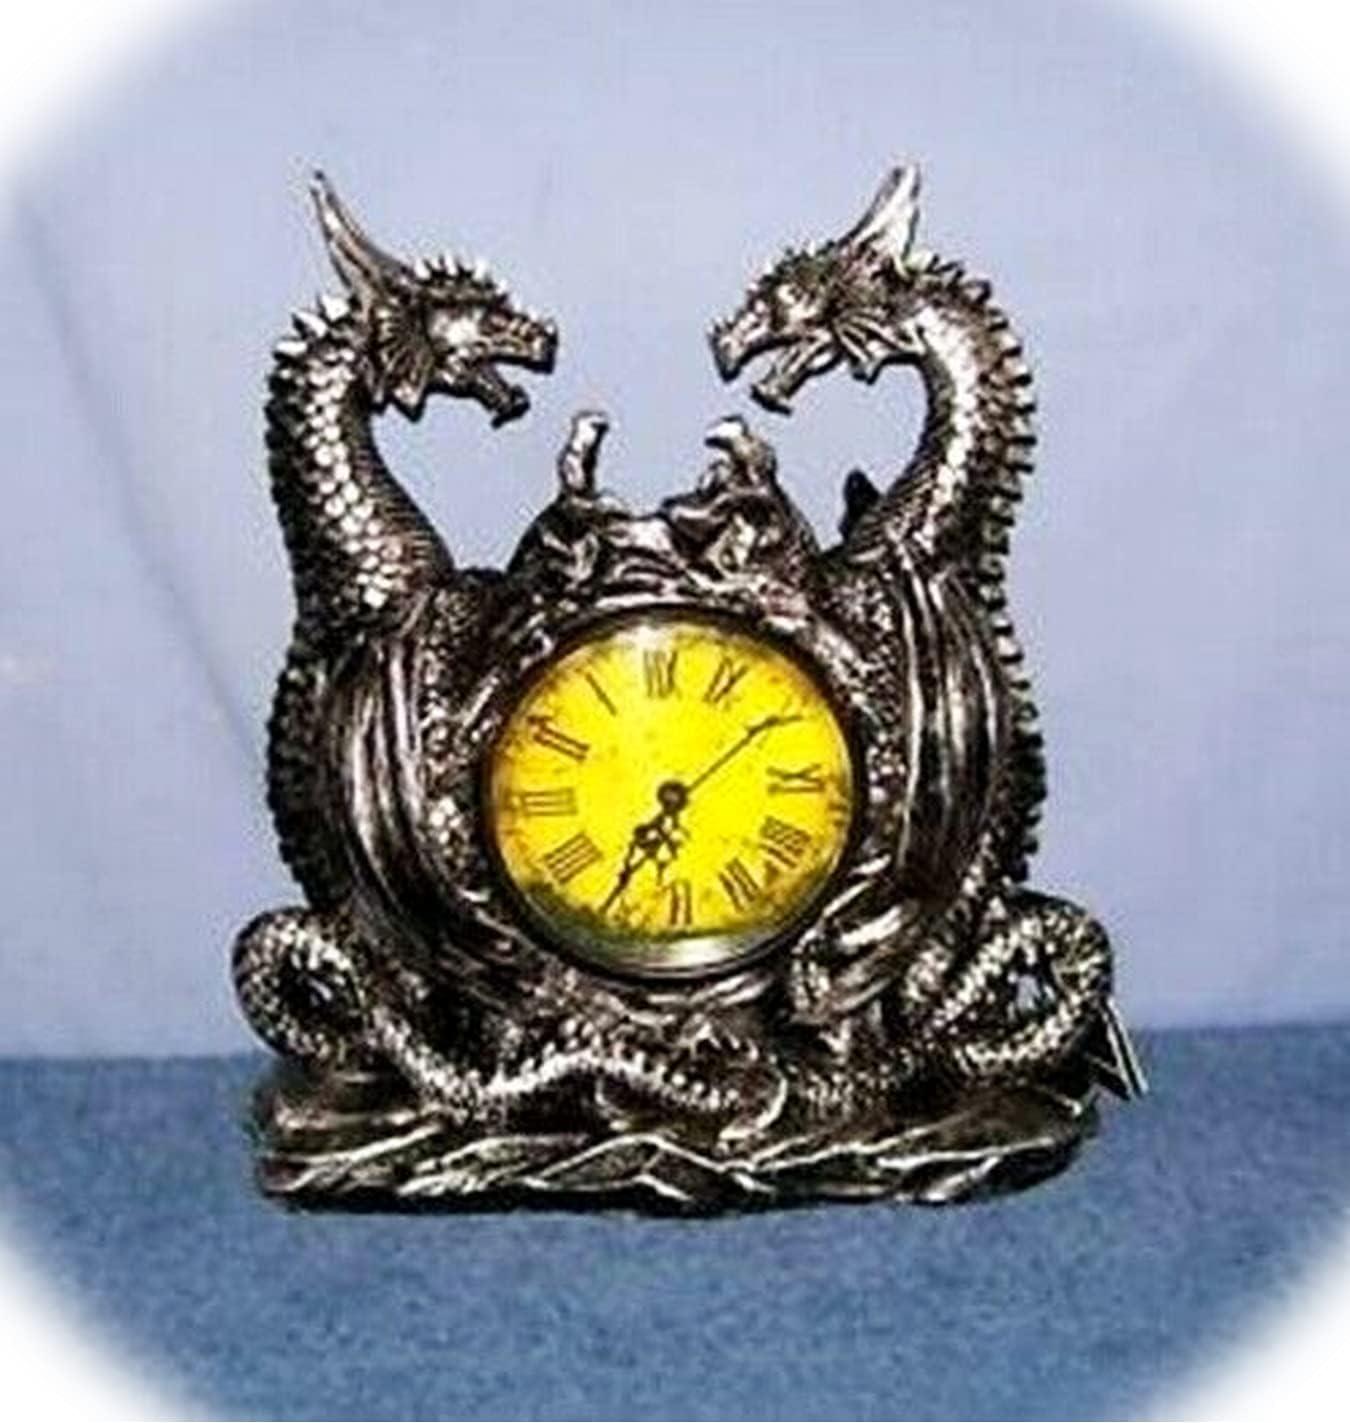 New In stock DRAGONSTAR - Twin Evil Bargain Dragons Figurine Clock A Charm Gothic